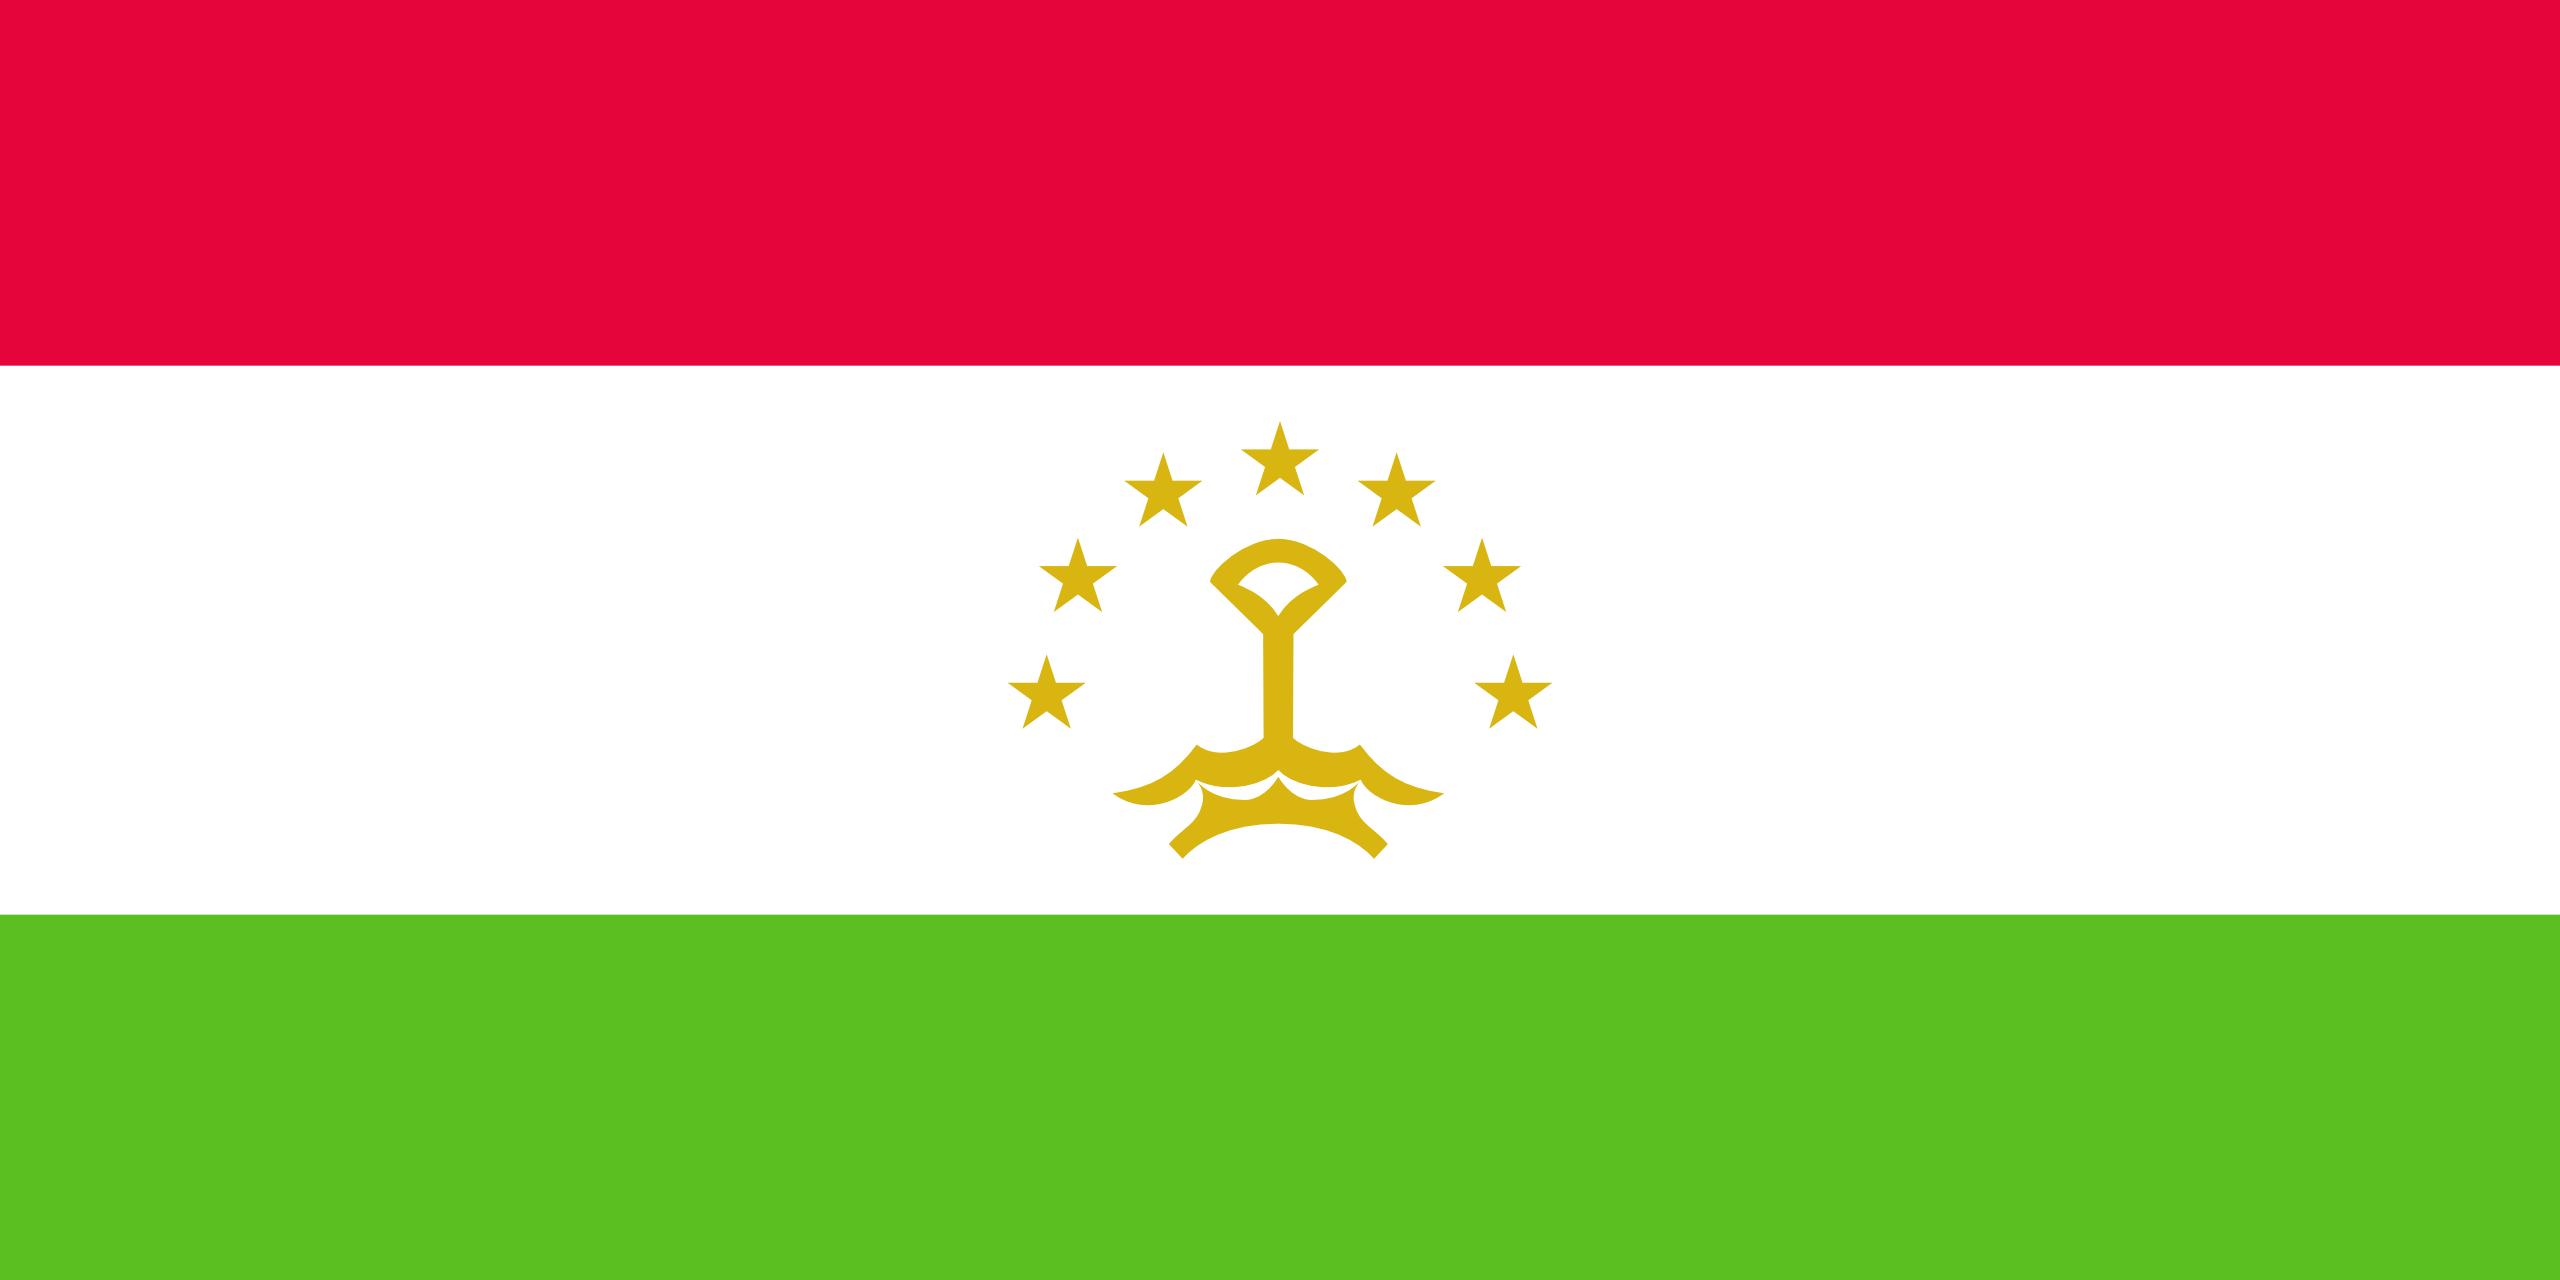 tayikistán, paese, emblema, logo, simbolo - Sfondi HD - Professor-falken.com